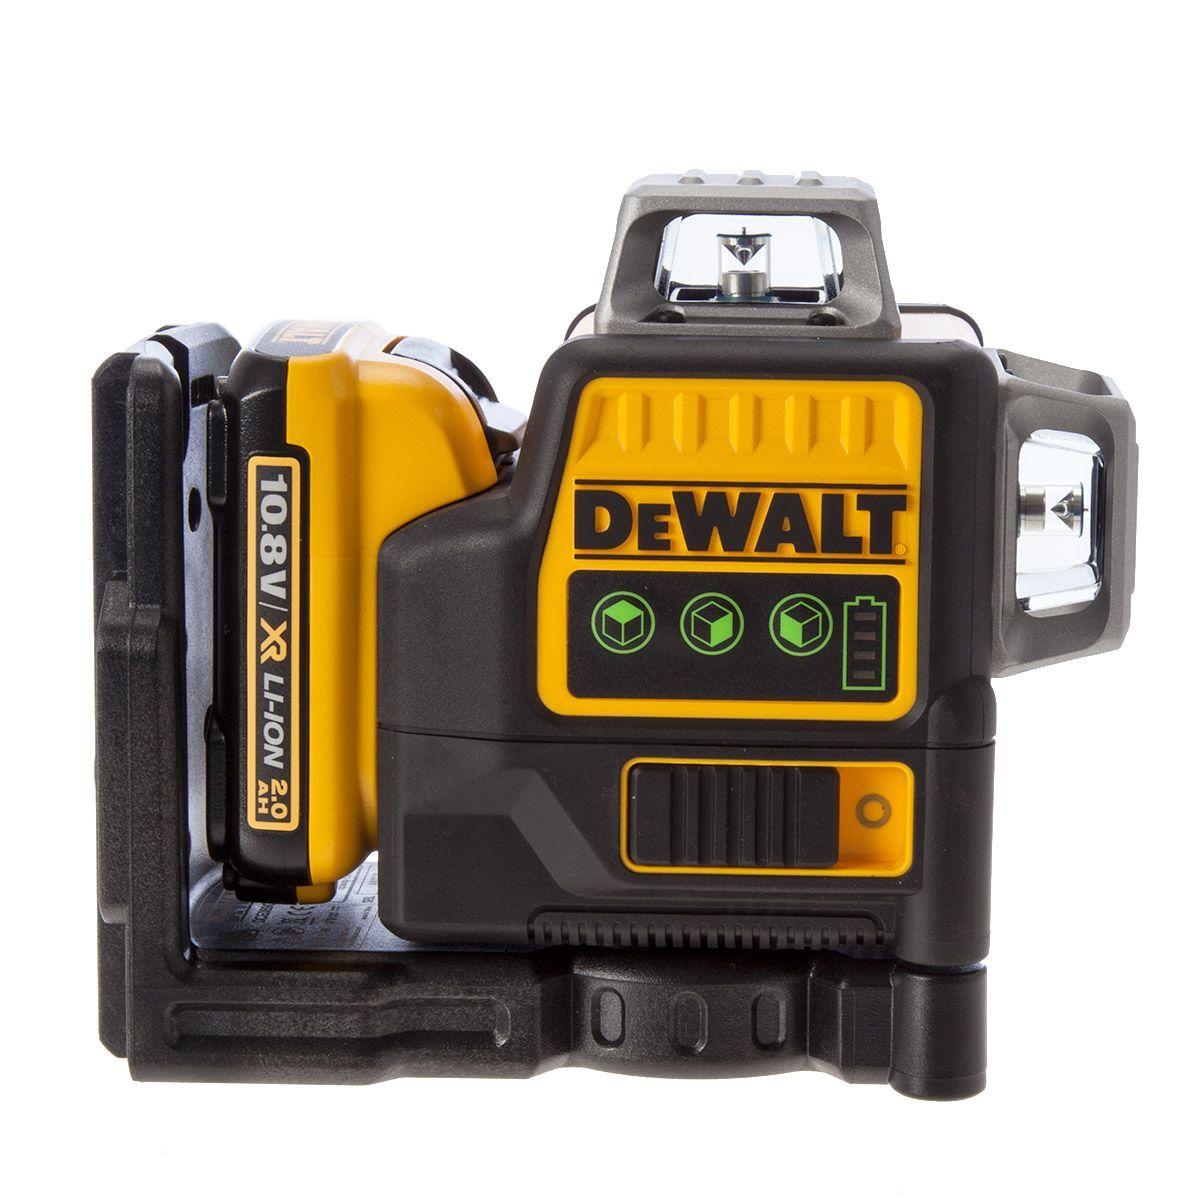 Dewalt Dce089d1g Sarjli Lazer Distomat Dewalt Dewalt Tools Mobile Tool Box